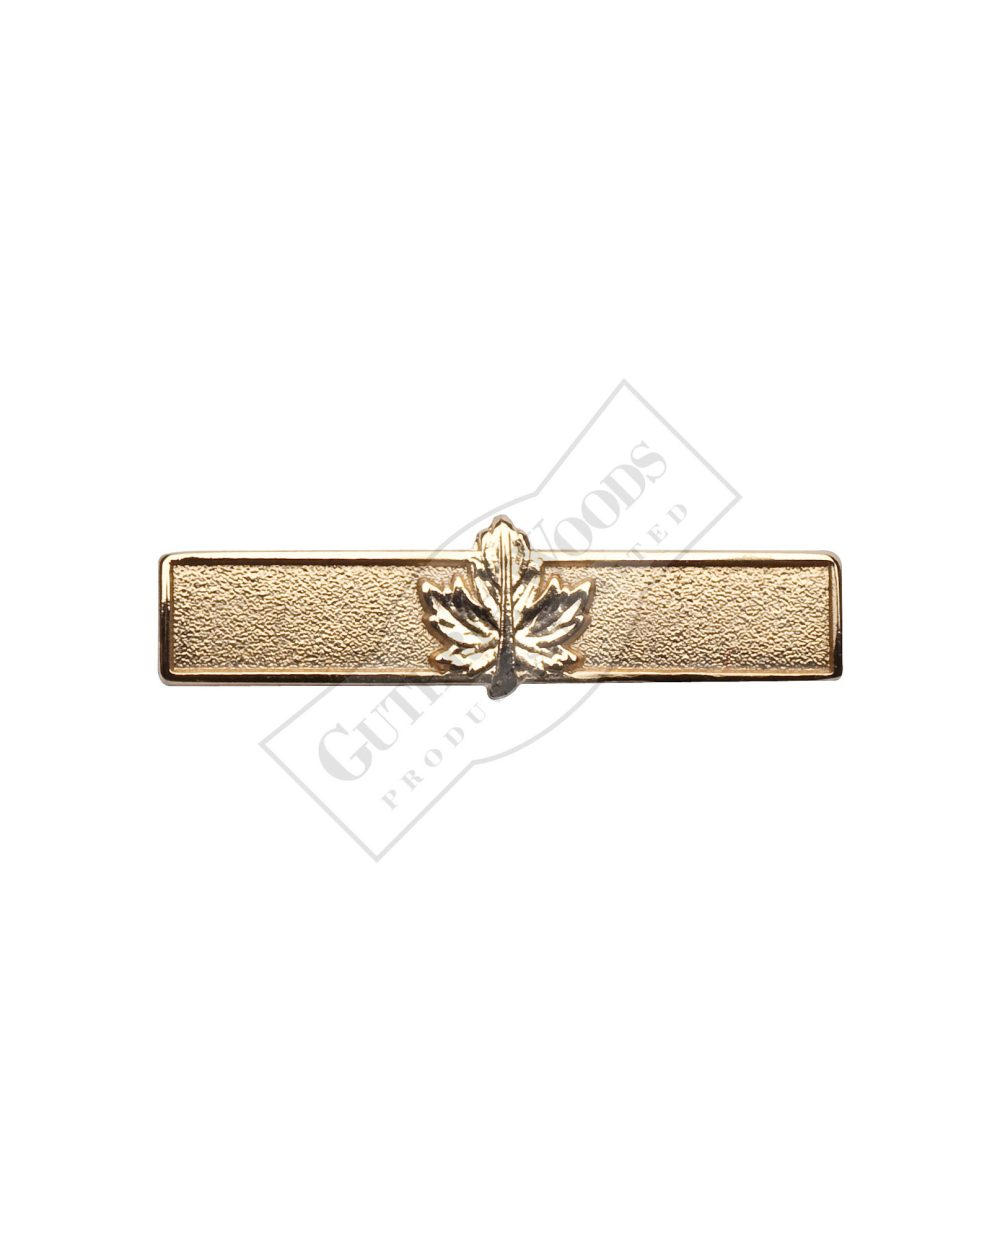 Rotation Bar - Gold - Single Leaf #245-G